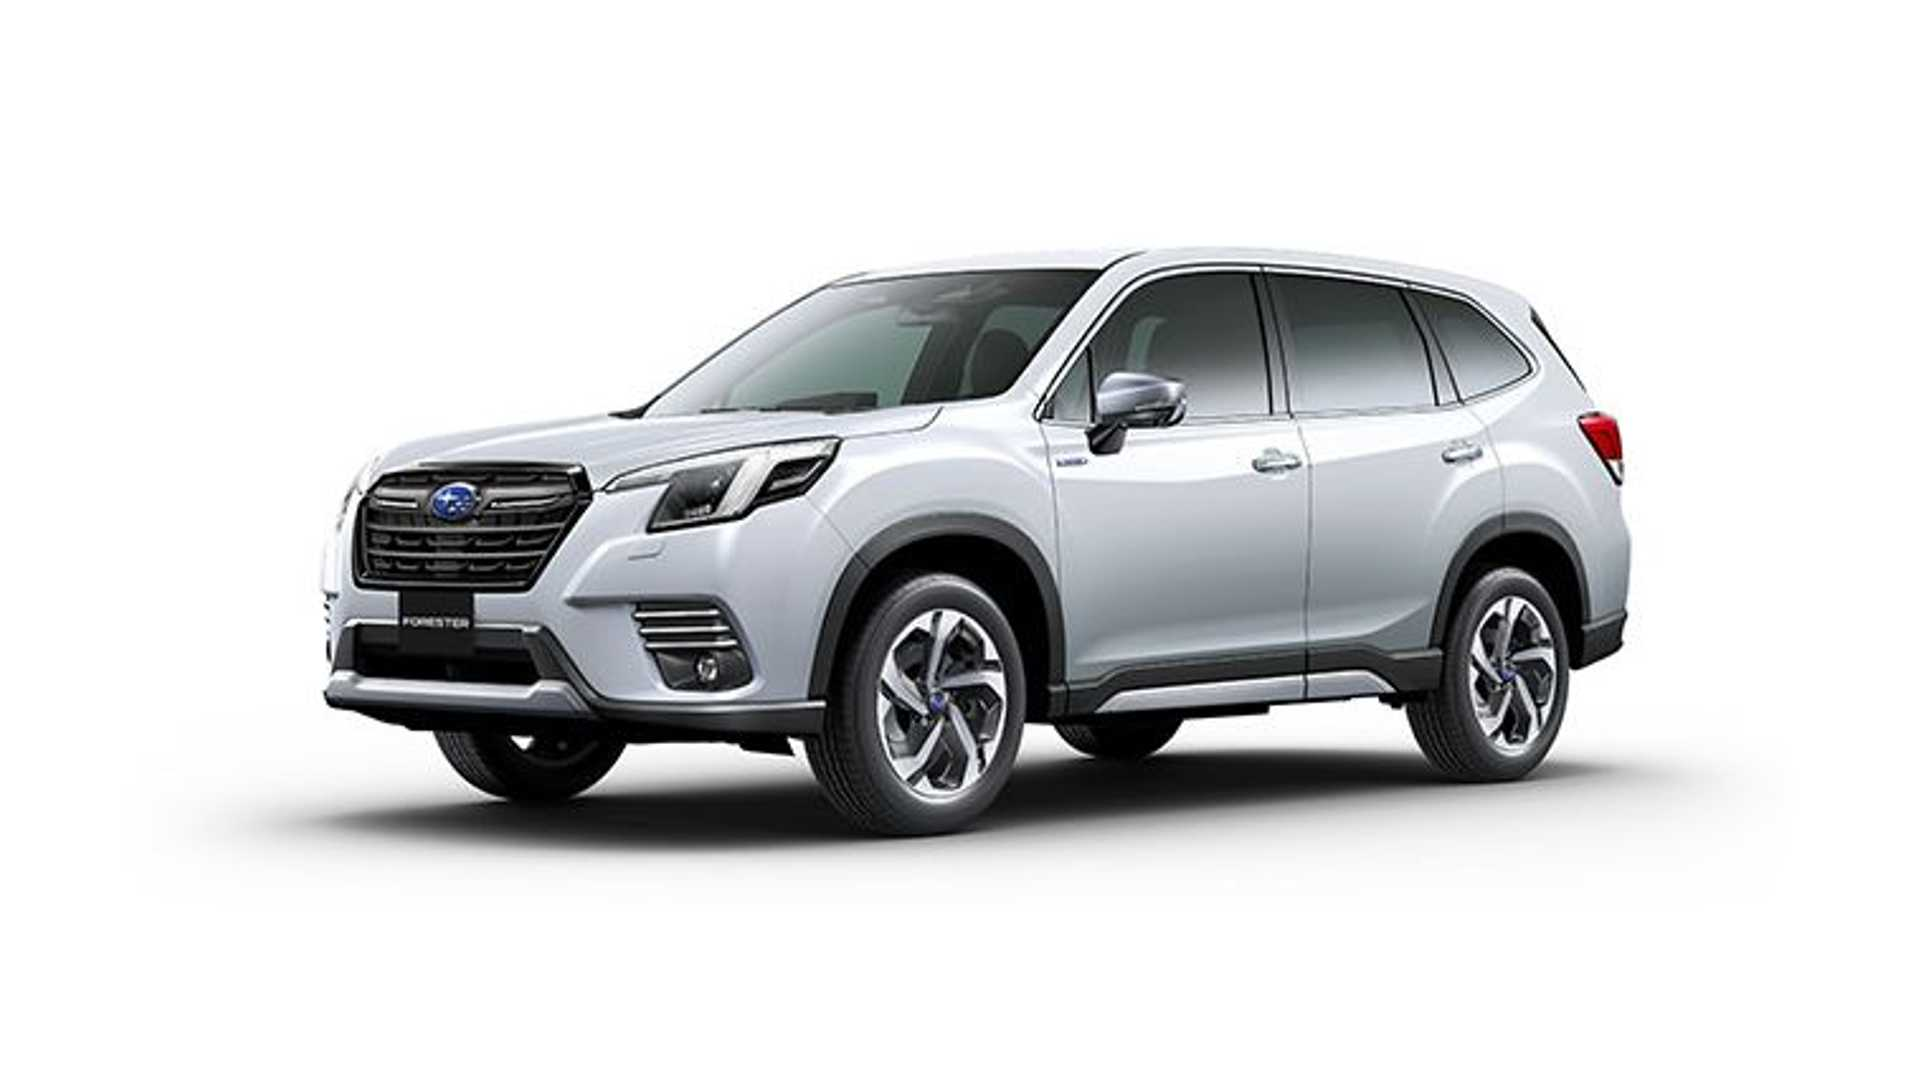 Subaru-Forester-facelift-9